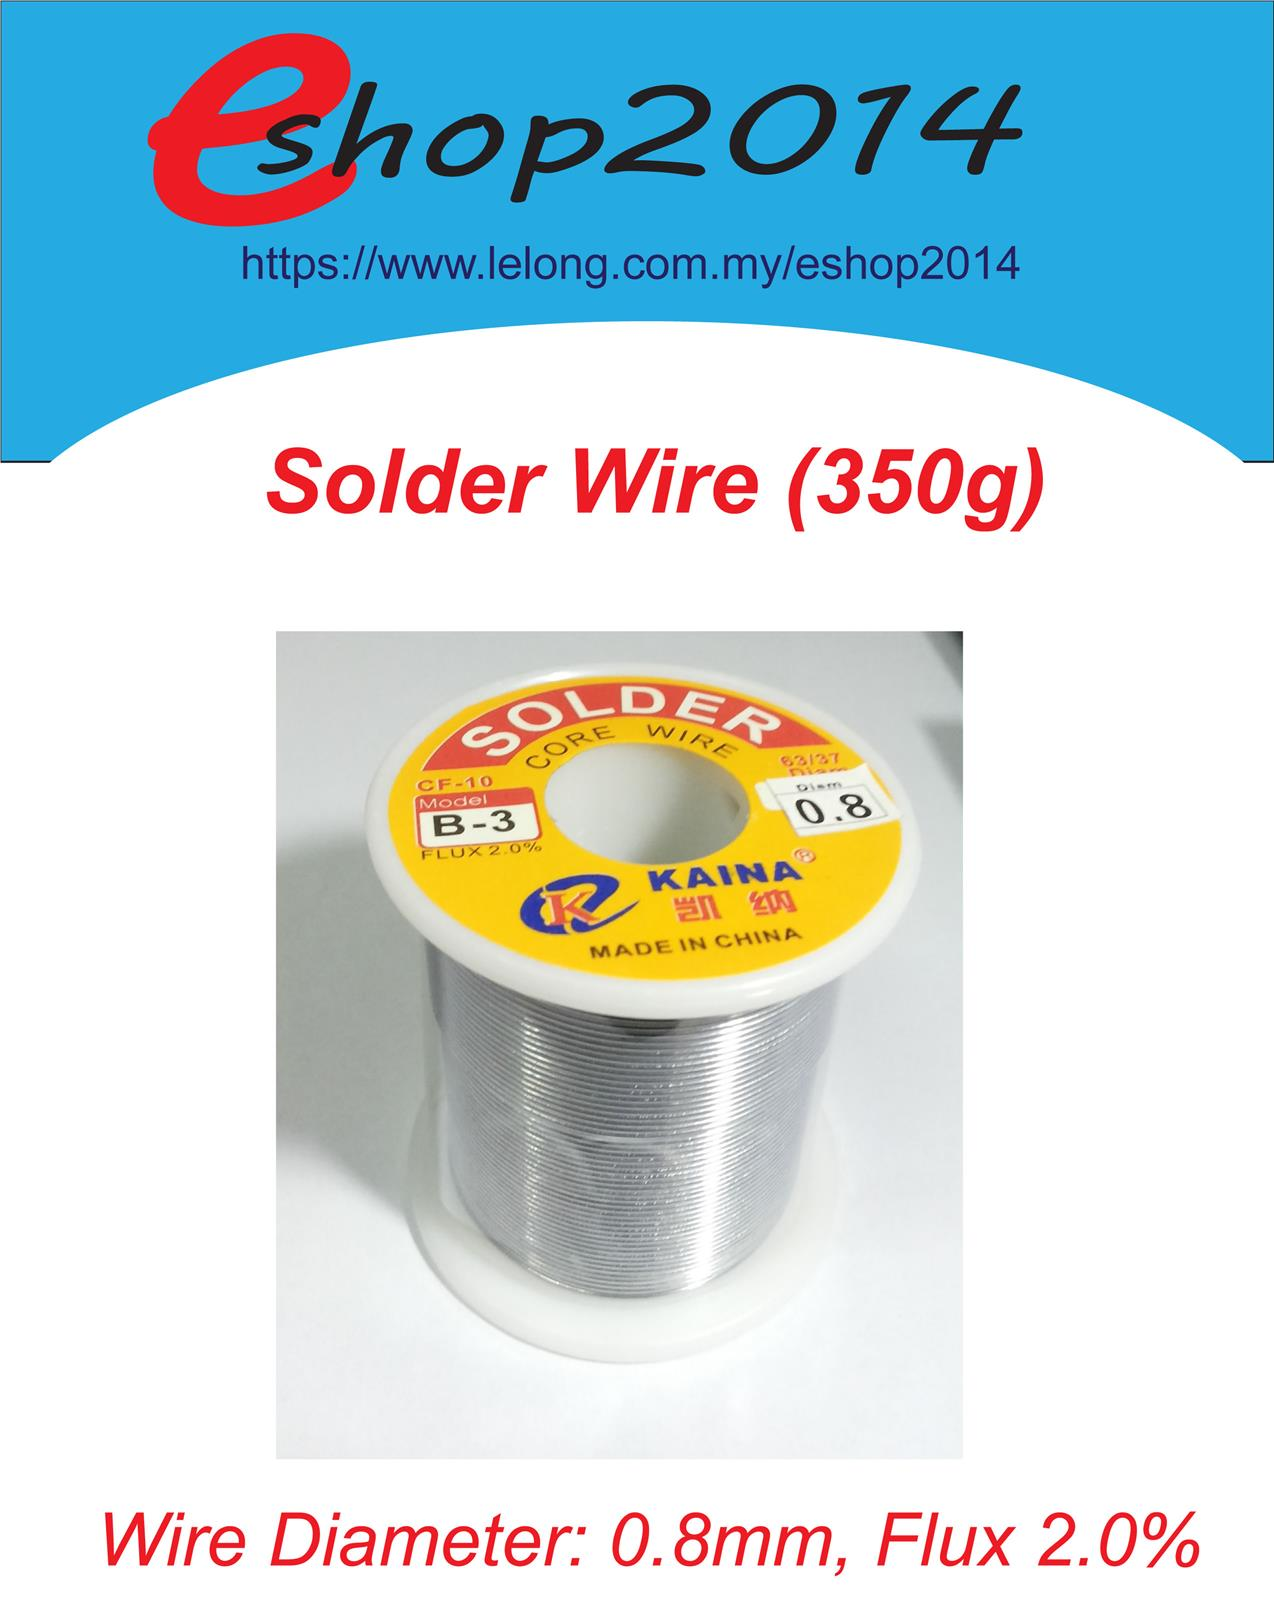 Solder Wire Rosin Core | 0 8mm 350g 63 37 Tin Lead Rosin C End 12 2 2018 7 32 Pm